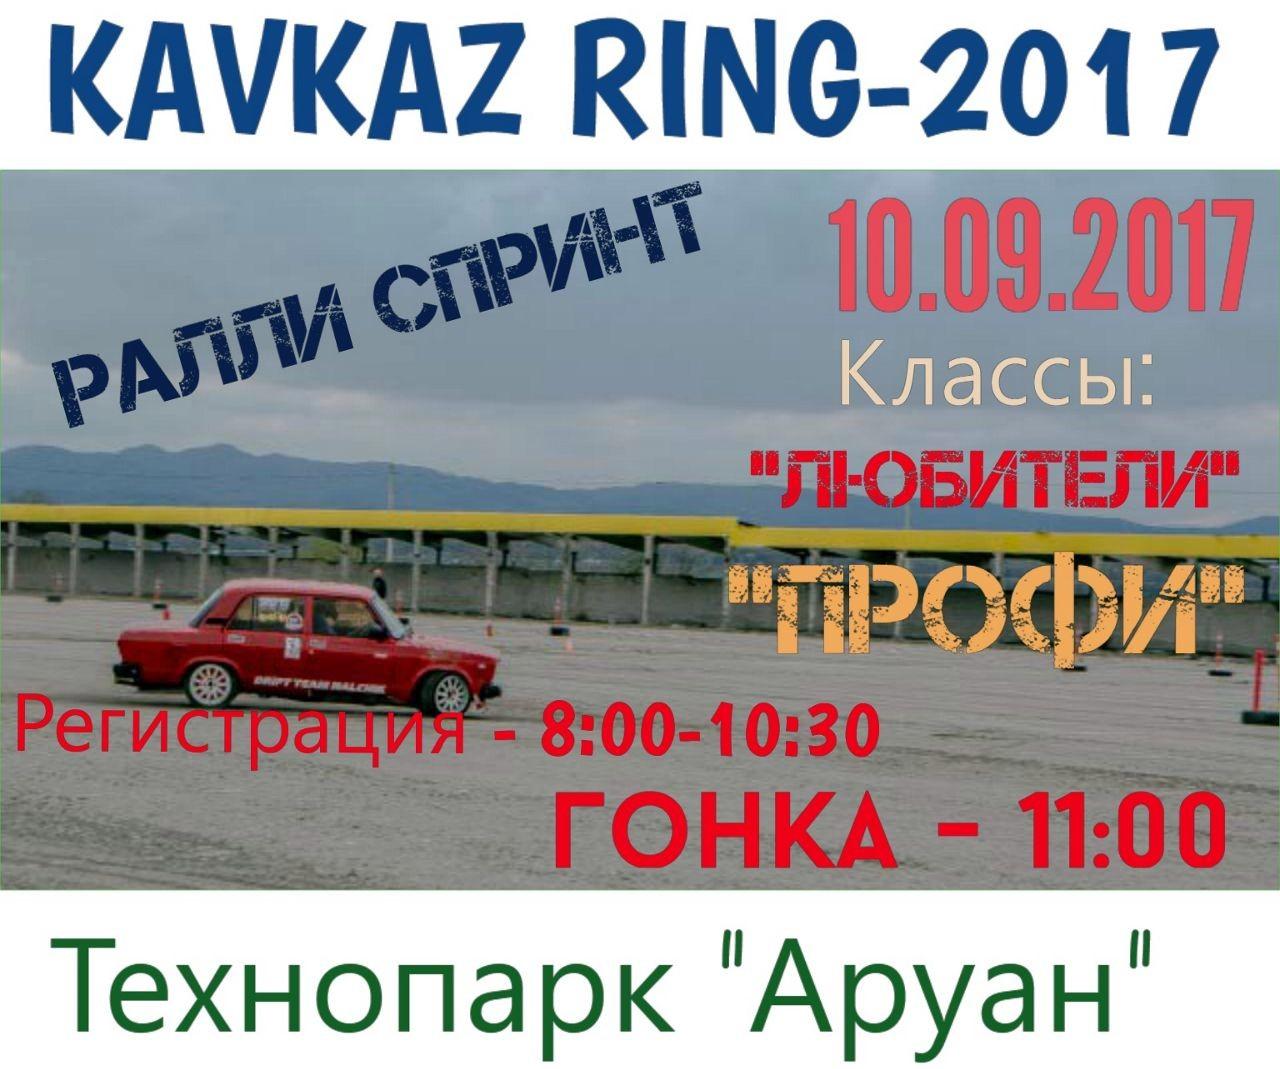 Kavkaz Ring111